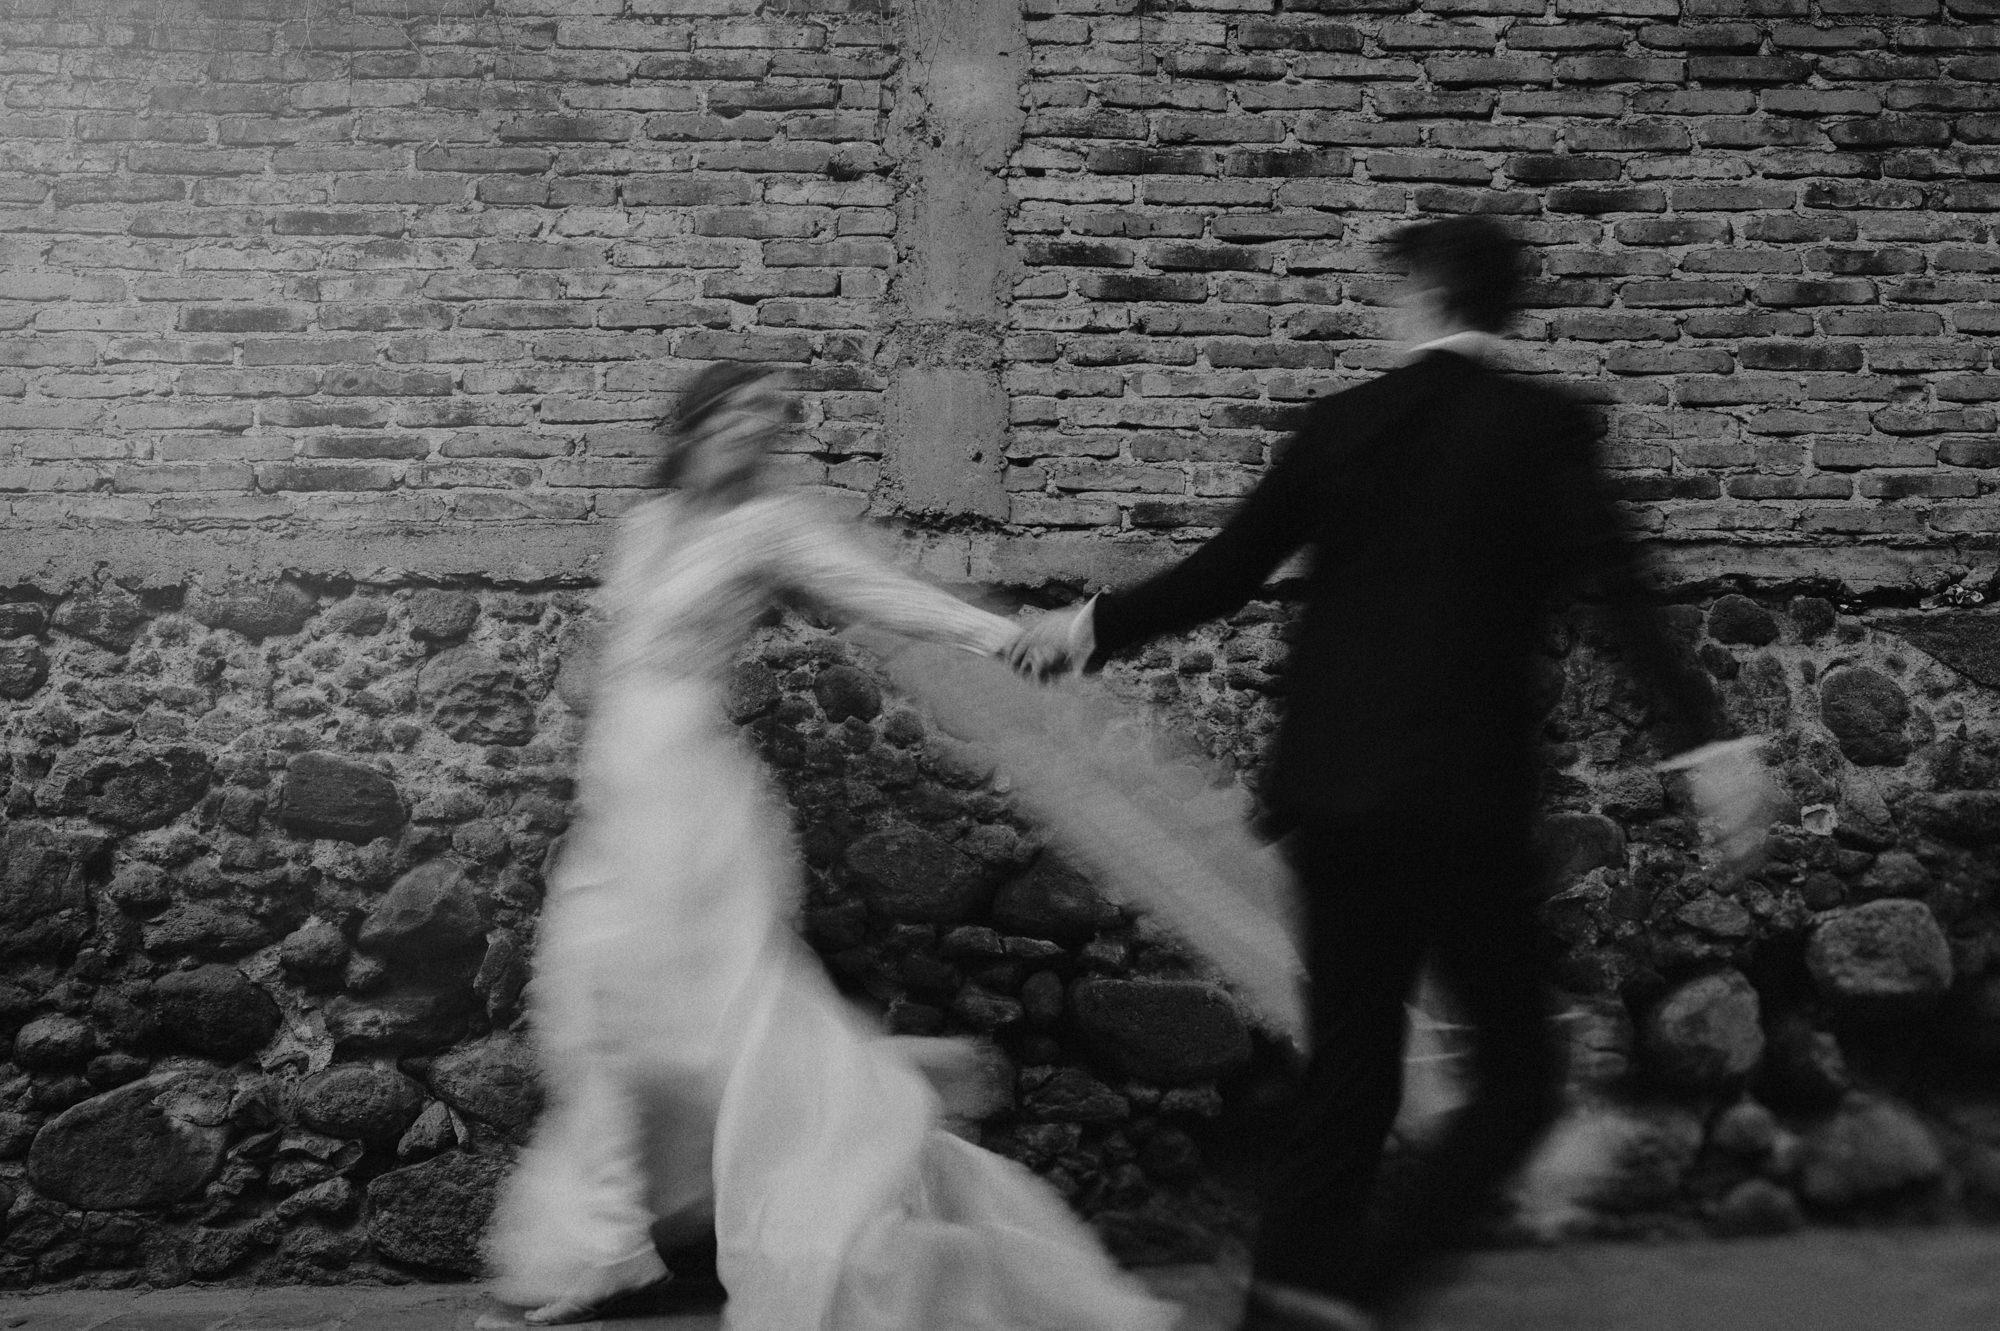 Long exposure of bride and groom dancing - photo by Fer Juaristi